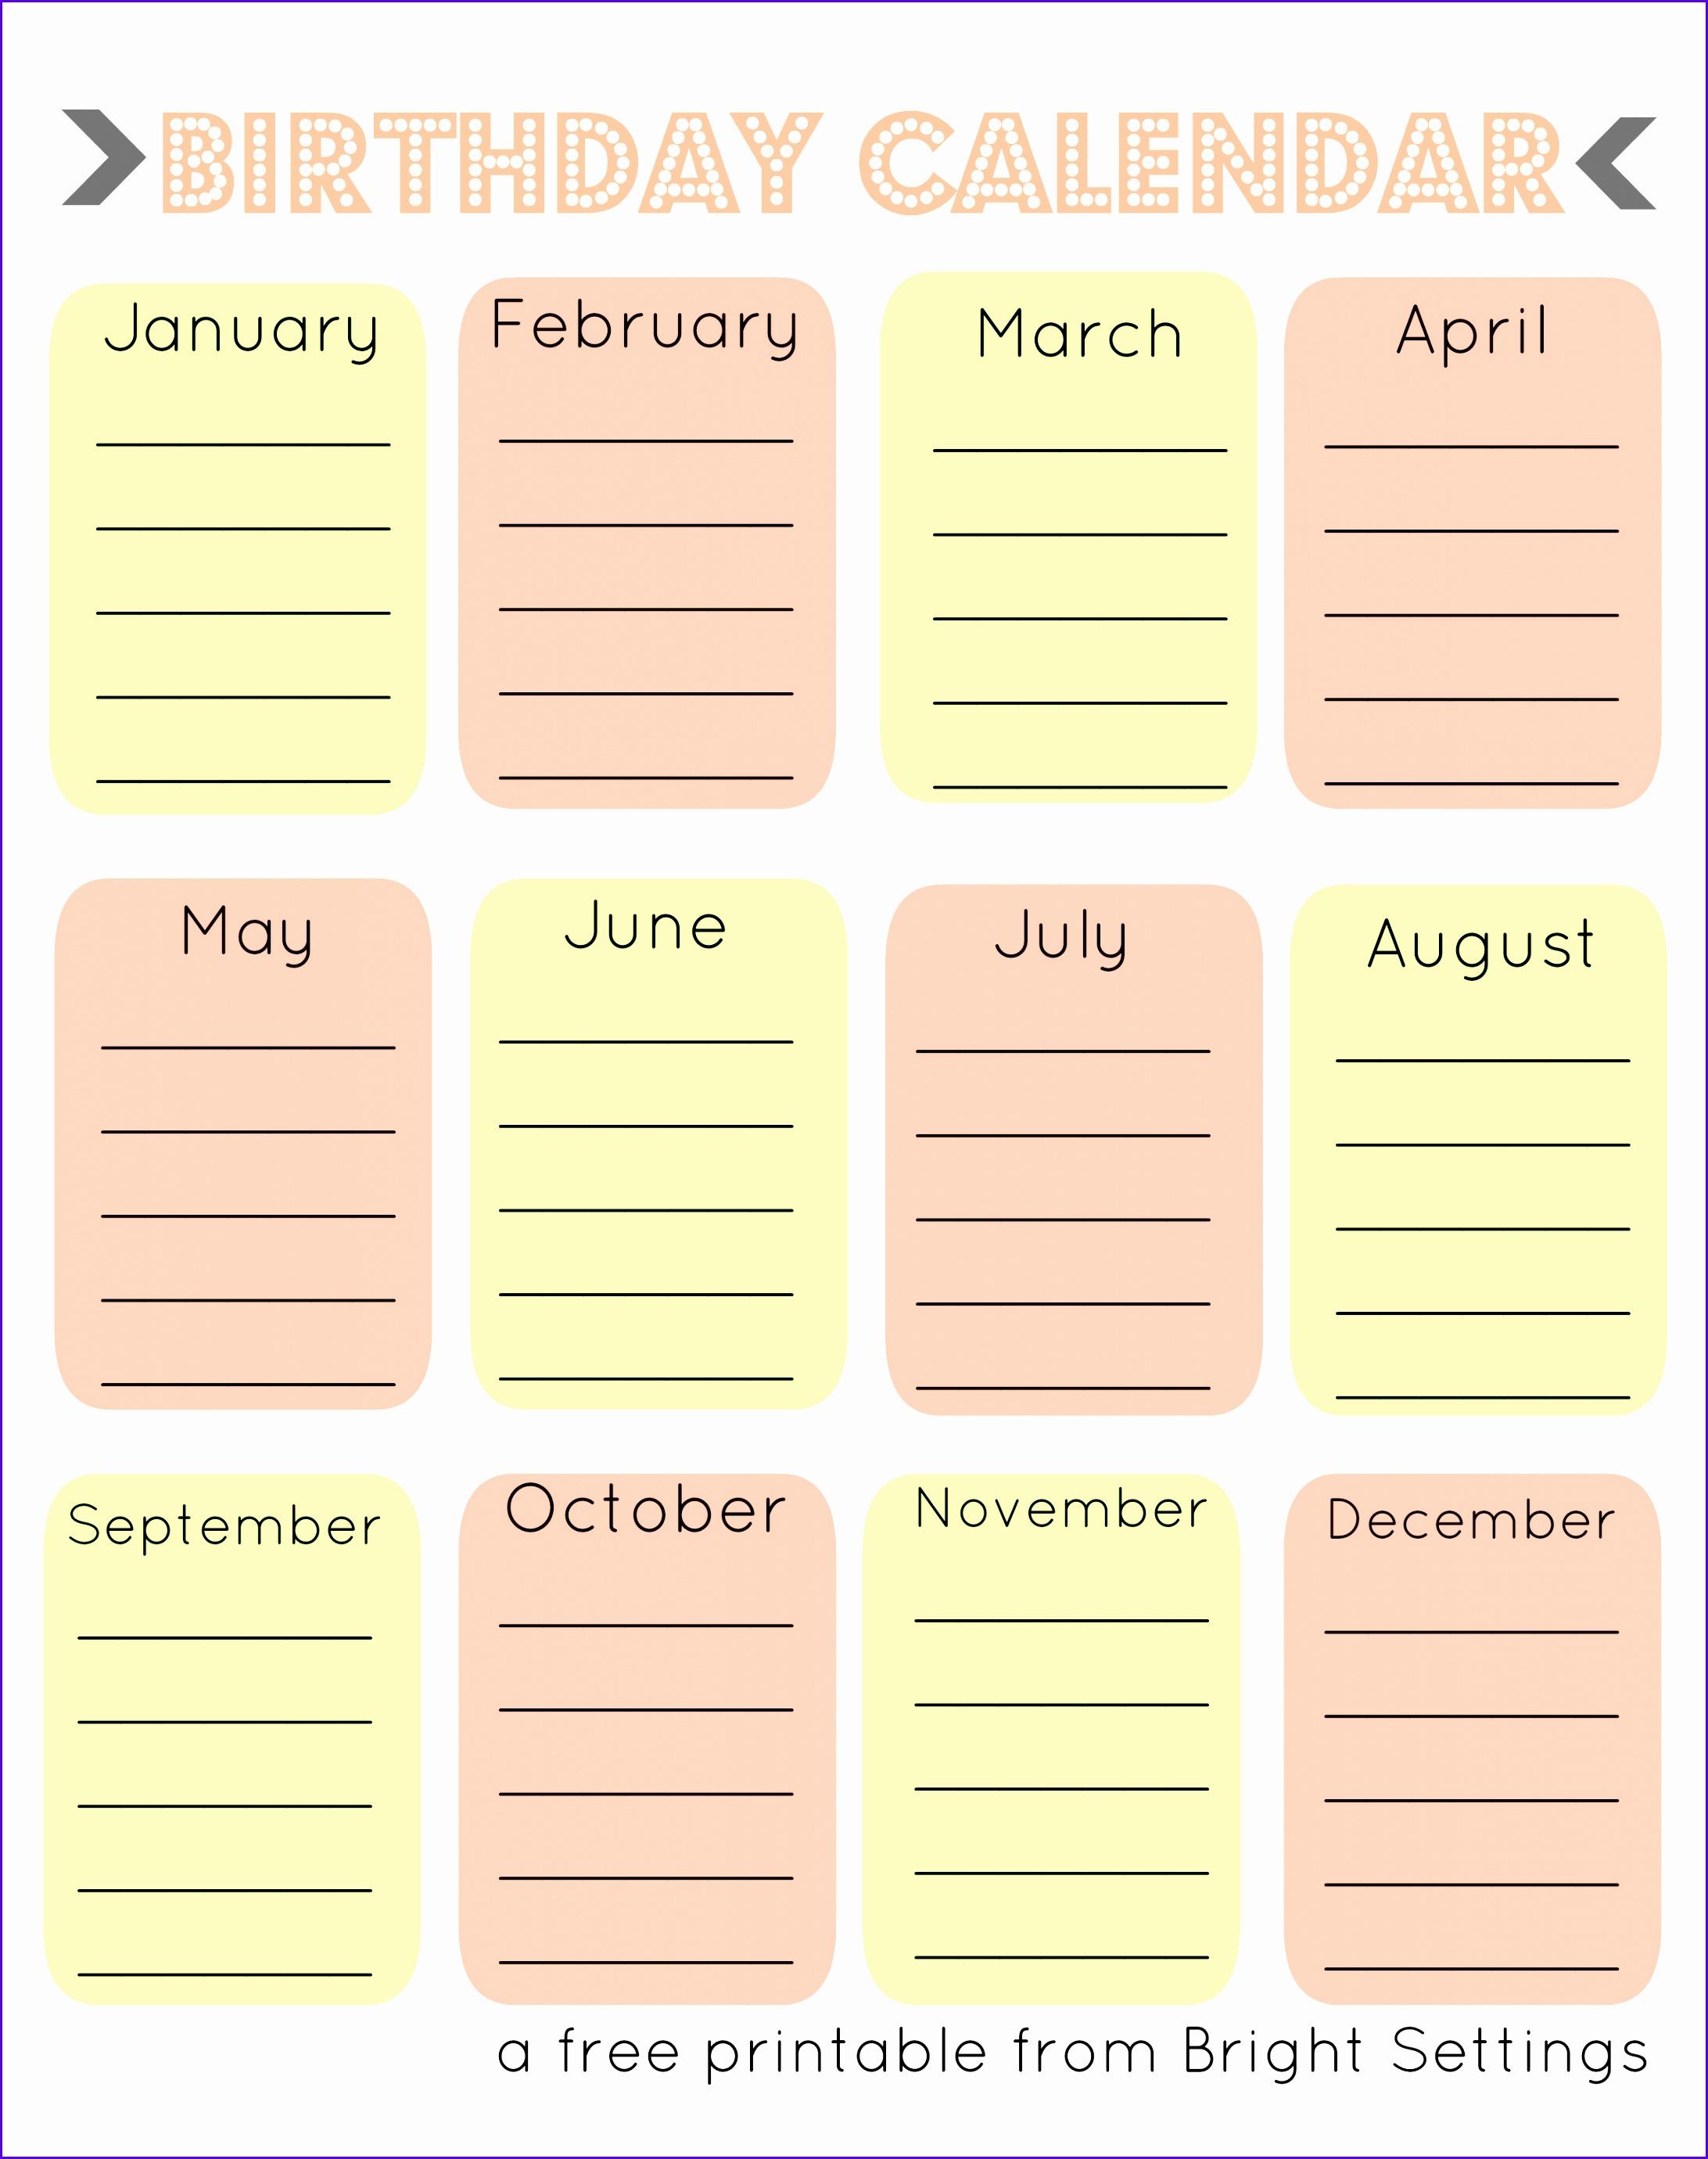 Printable 2018 Calendars PDF – Calendar 12 blank monthly calendar blank monthly calendar template blank monthly calendar 2017 printable blank 21842760